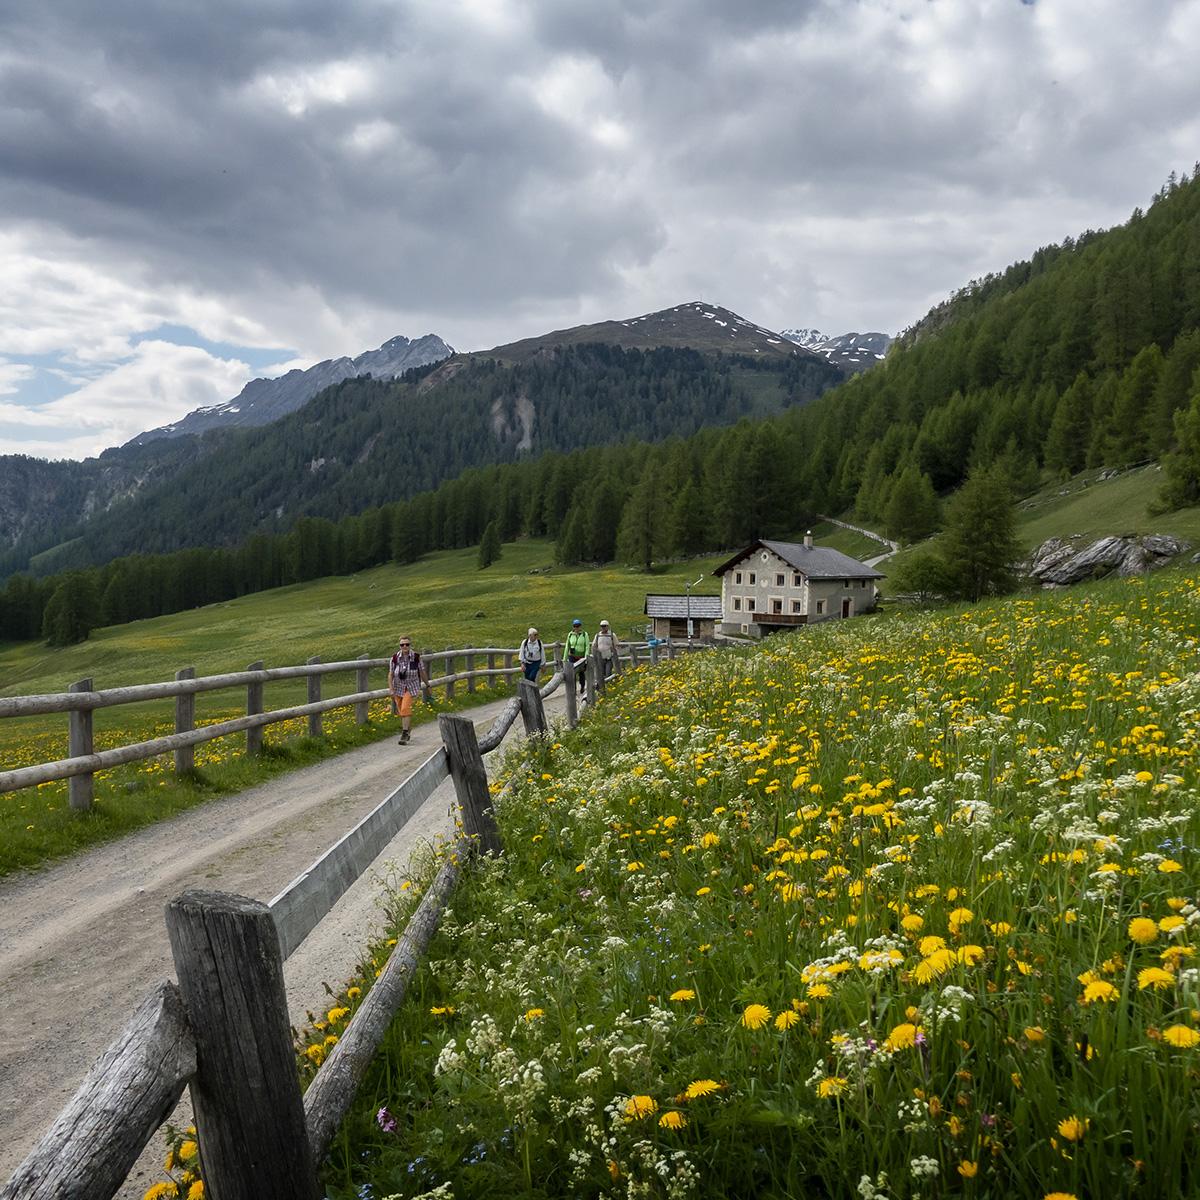 Wanderung Nationalpark / Val Muestair, 9. - 13. Juni 2021 © Valerie Chetelat